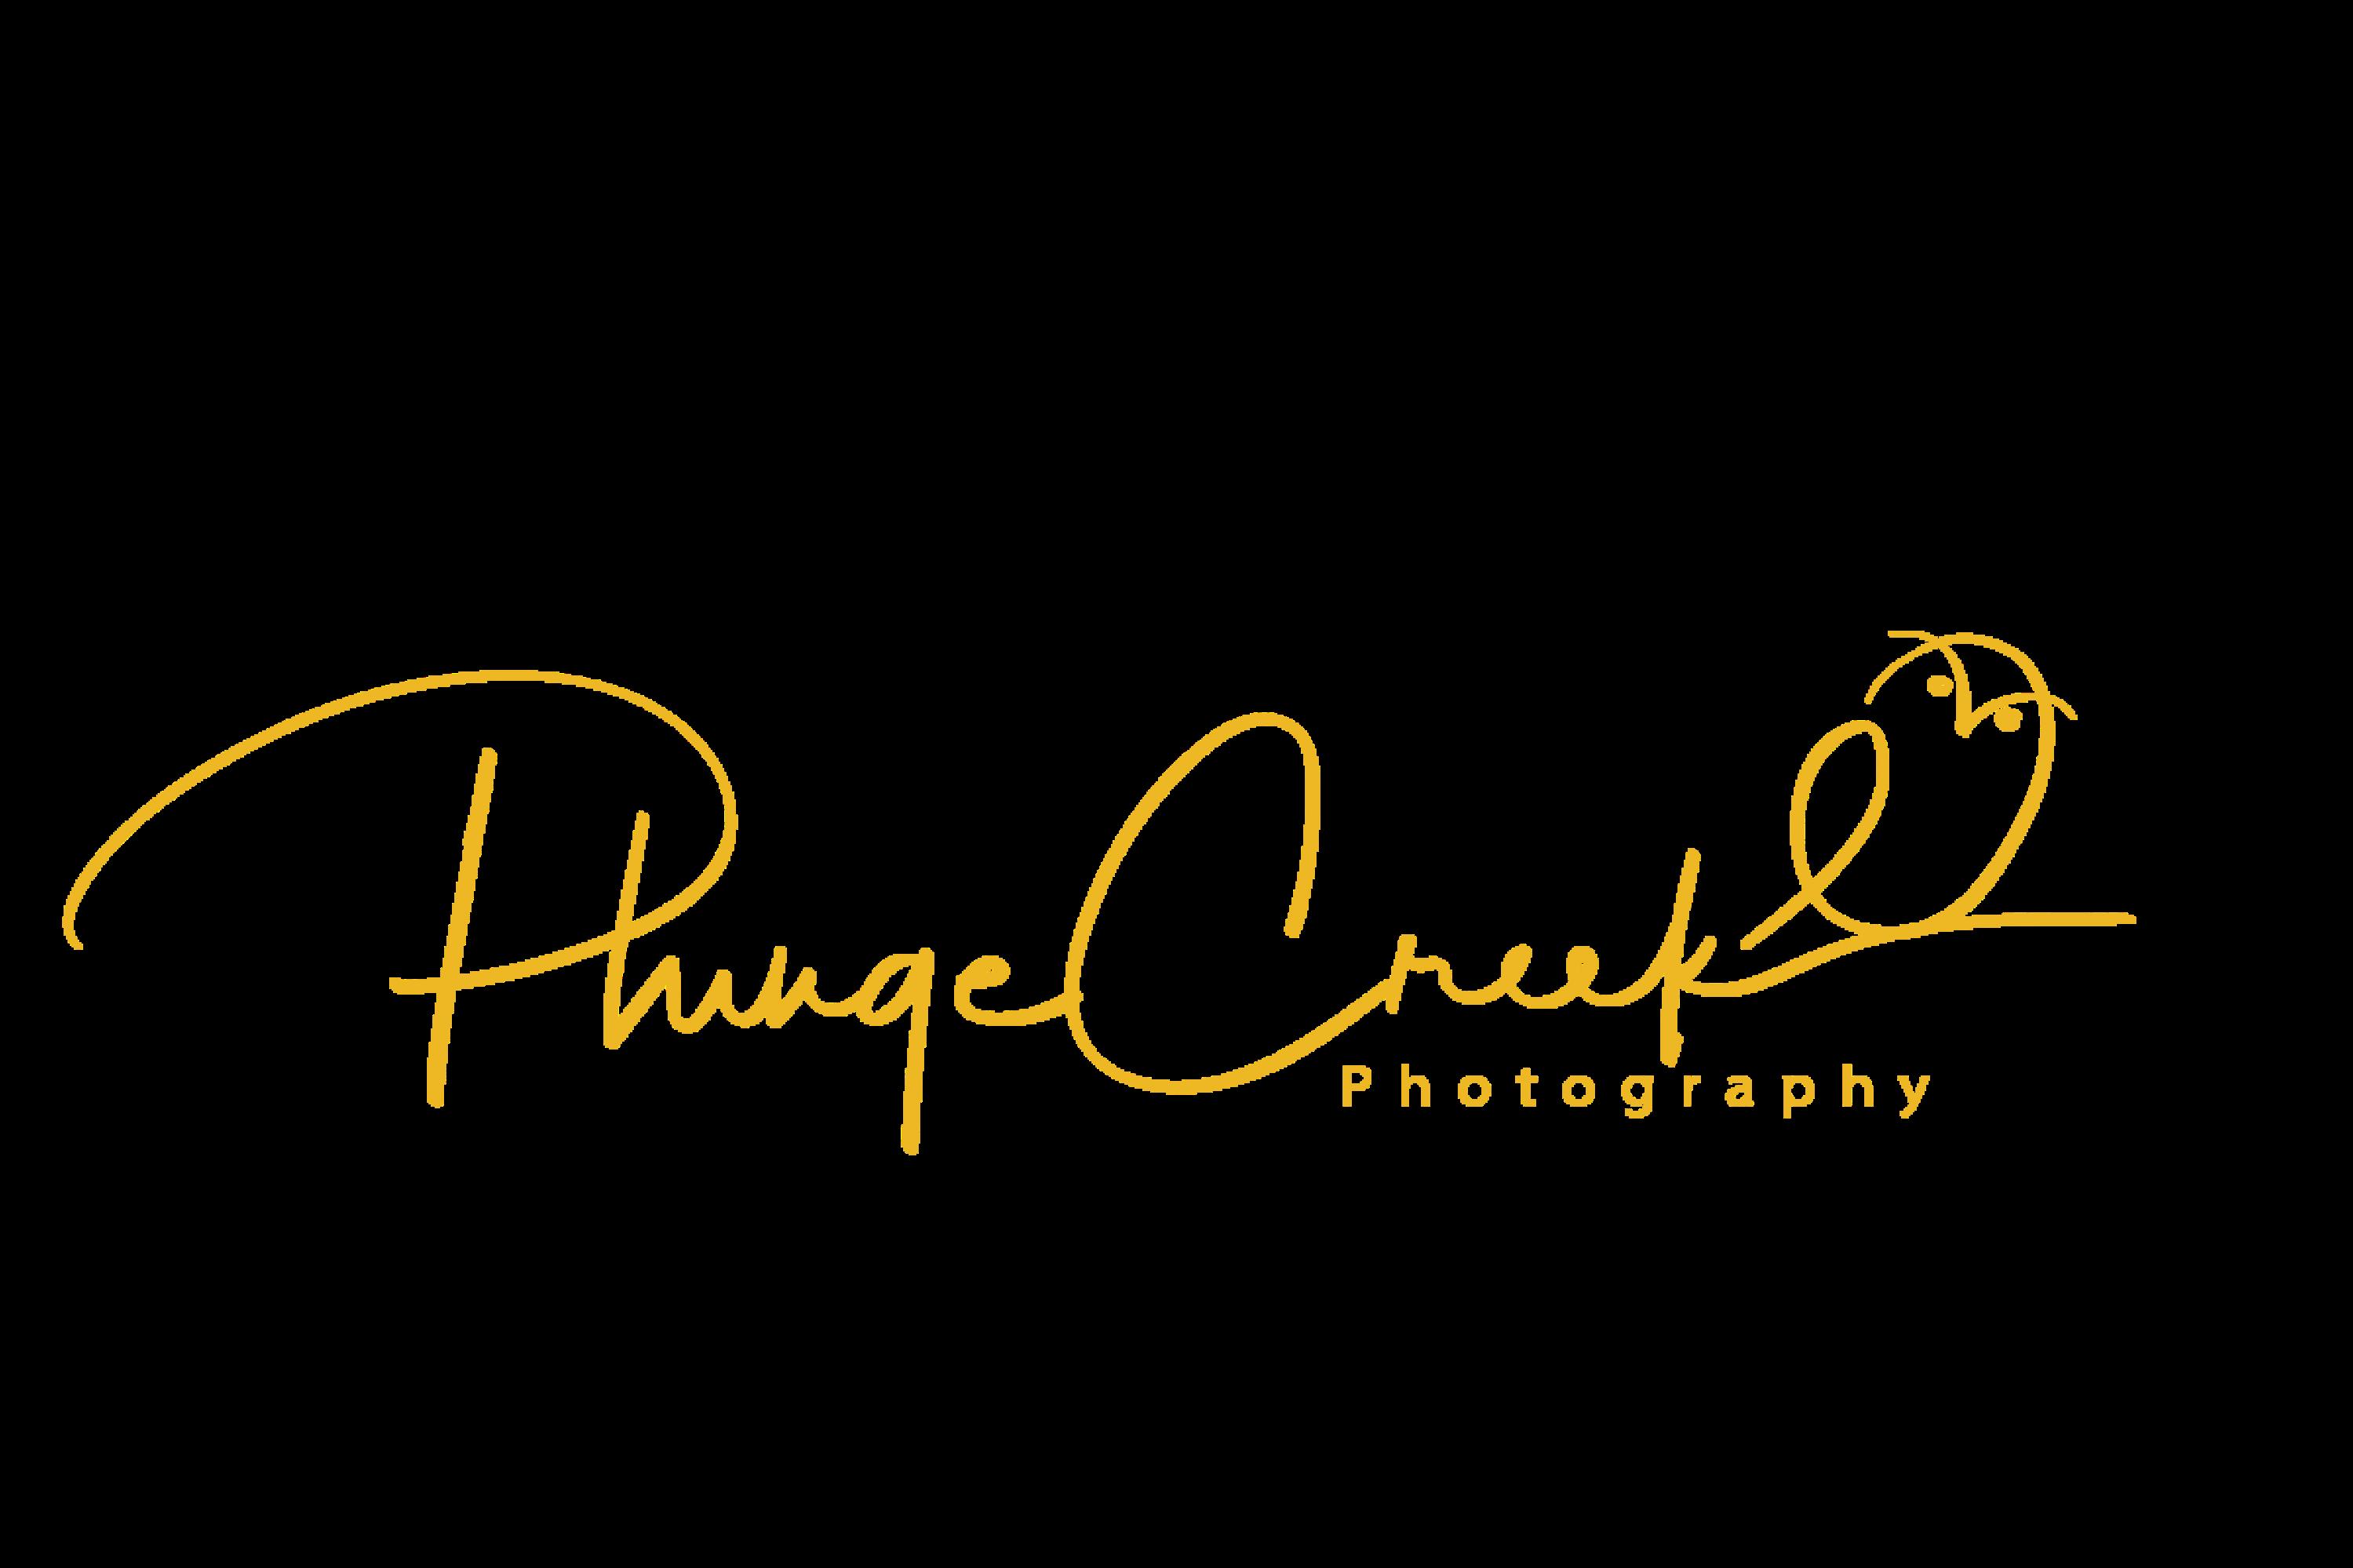 Plunge Creek Photography